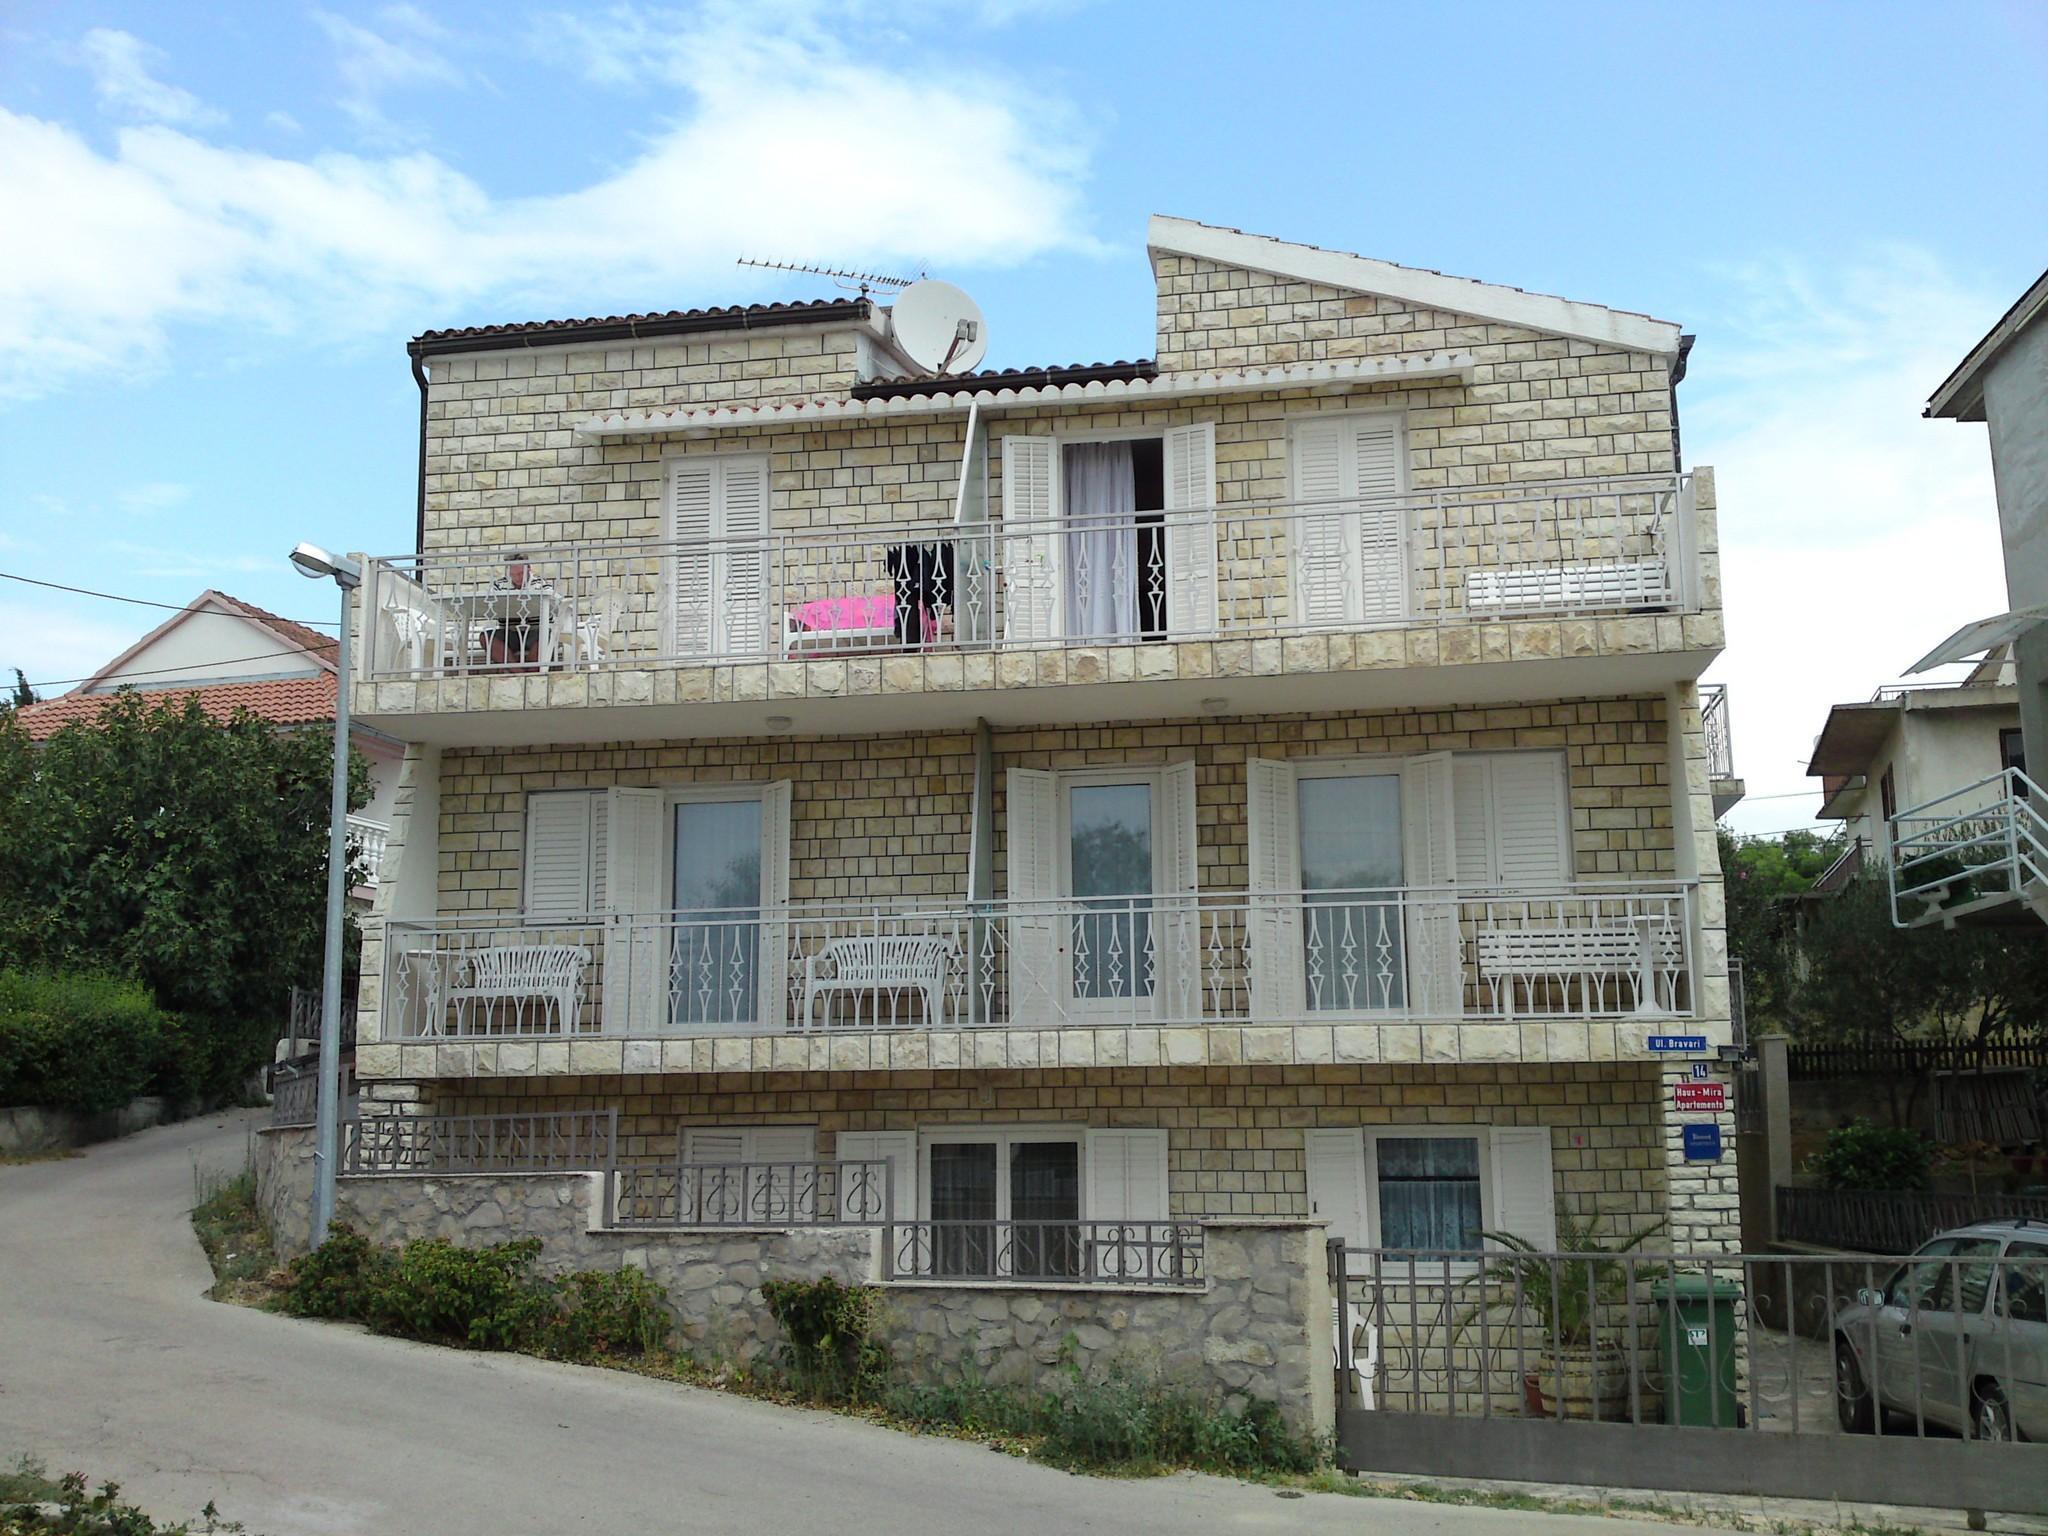 Haus-Mira Apartments - A2 No 8303-2